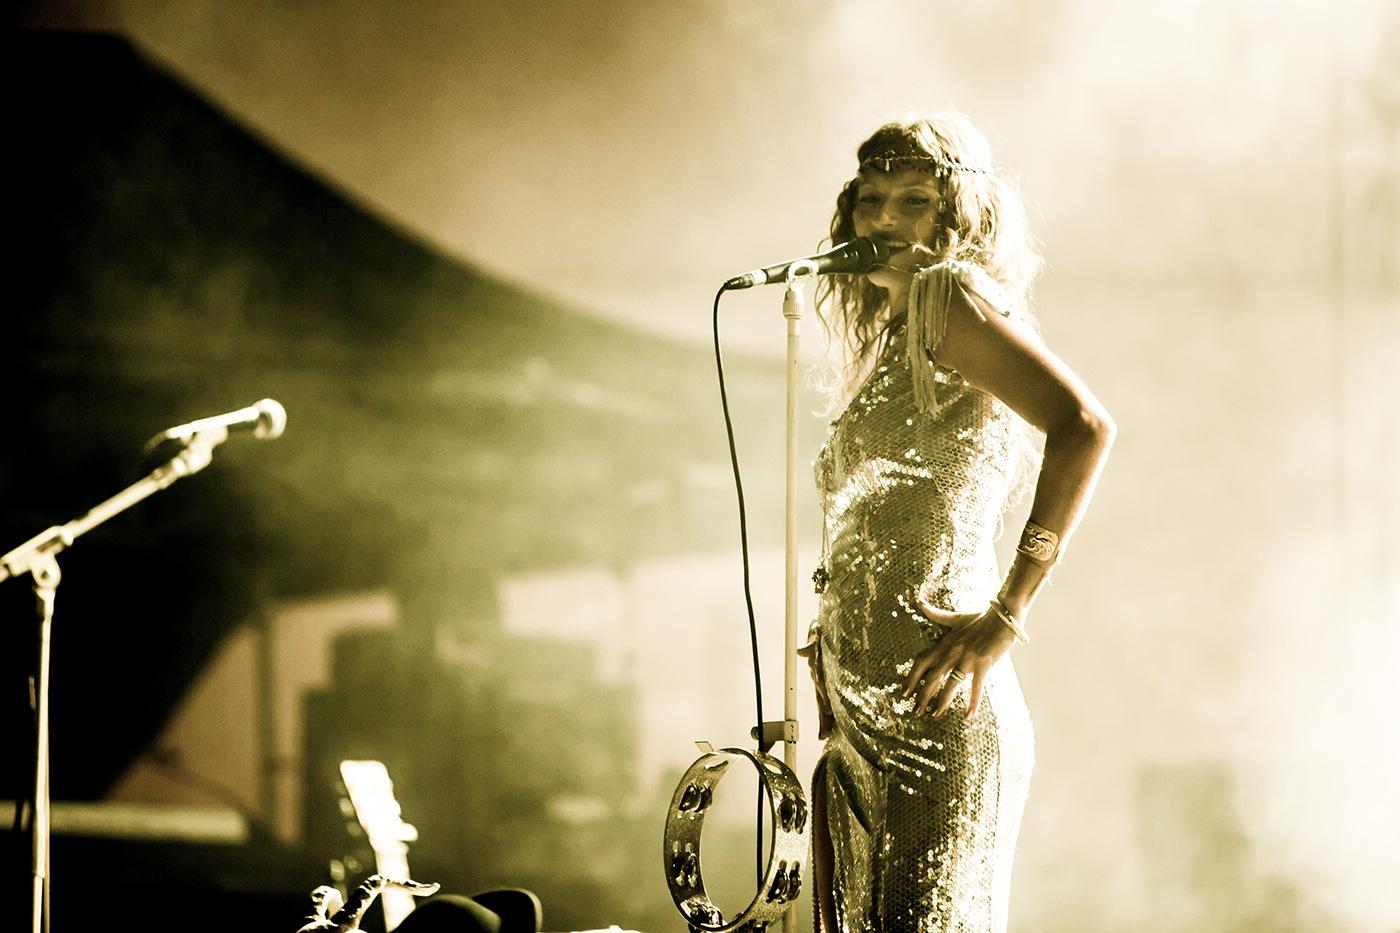 photographe-reportage-festival-rockadel-guillaume-heraud-006-small